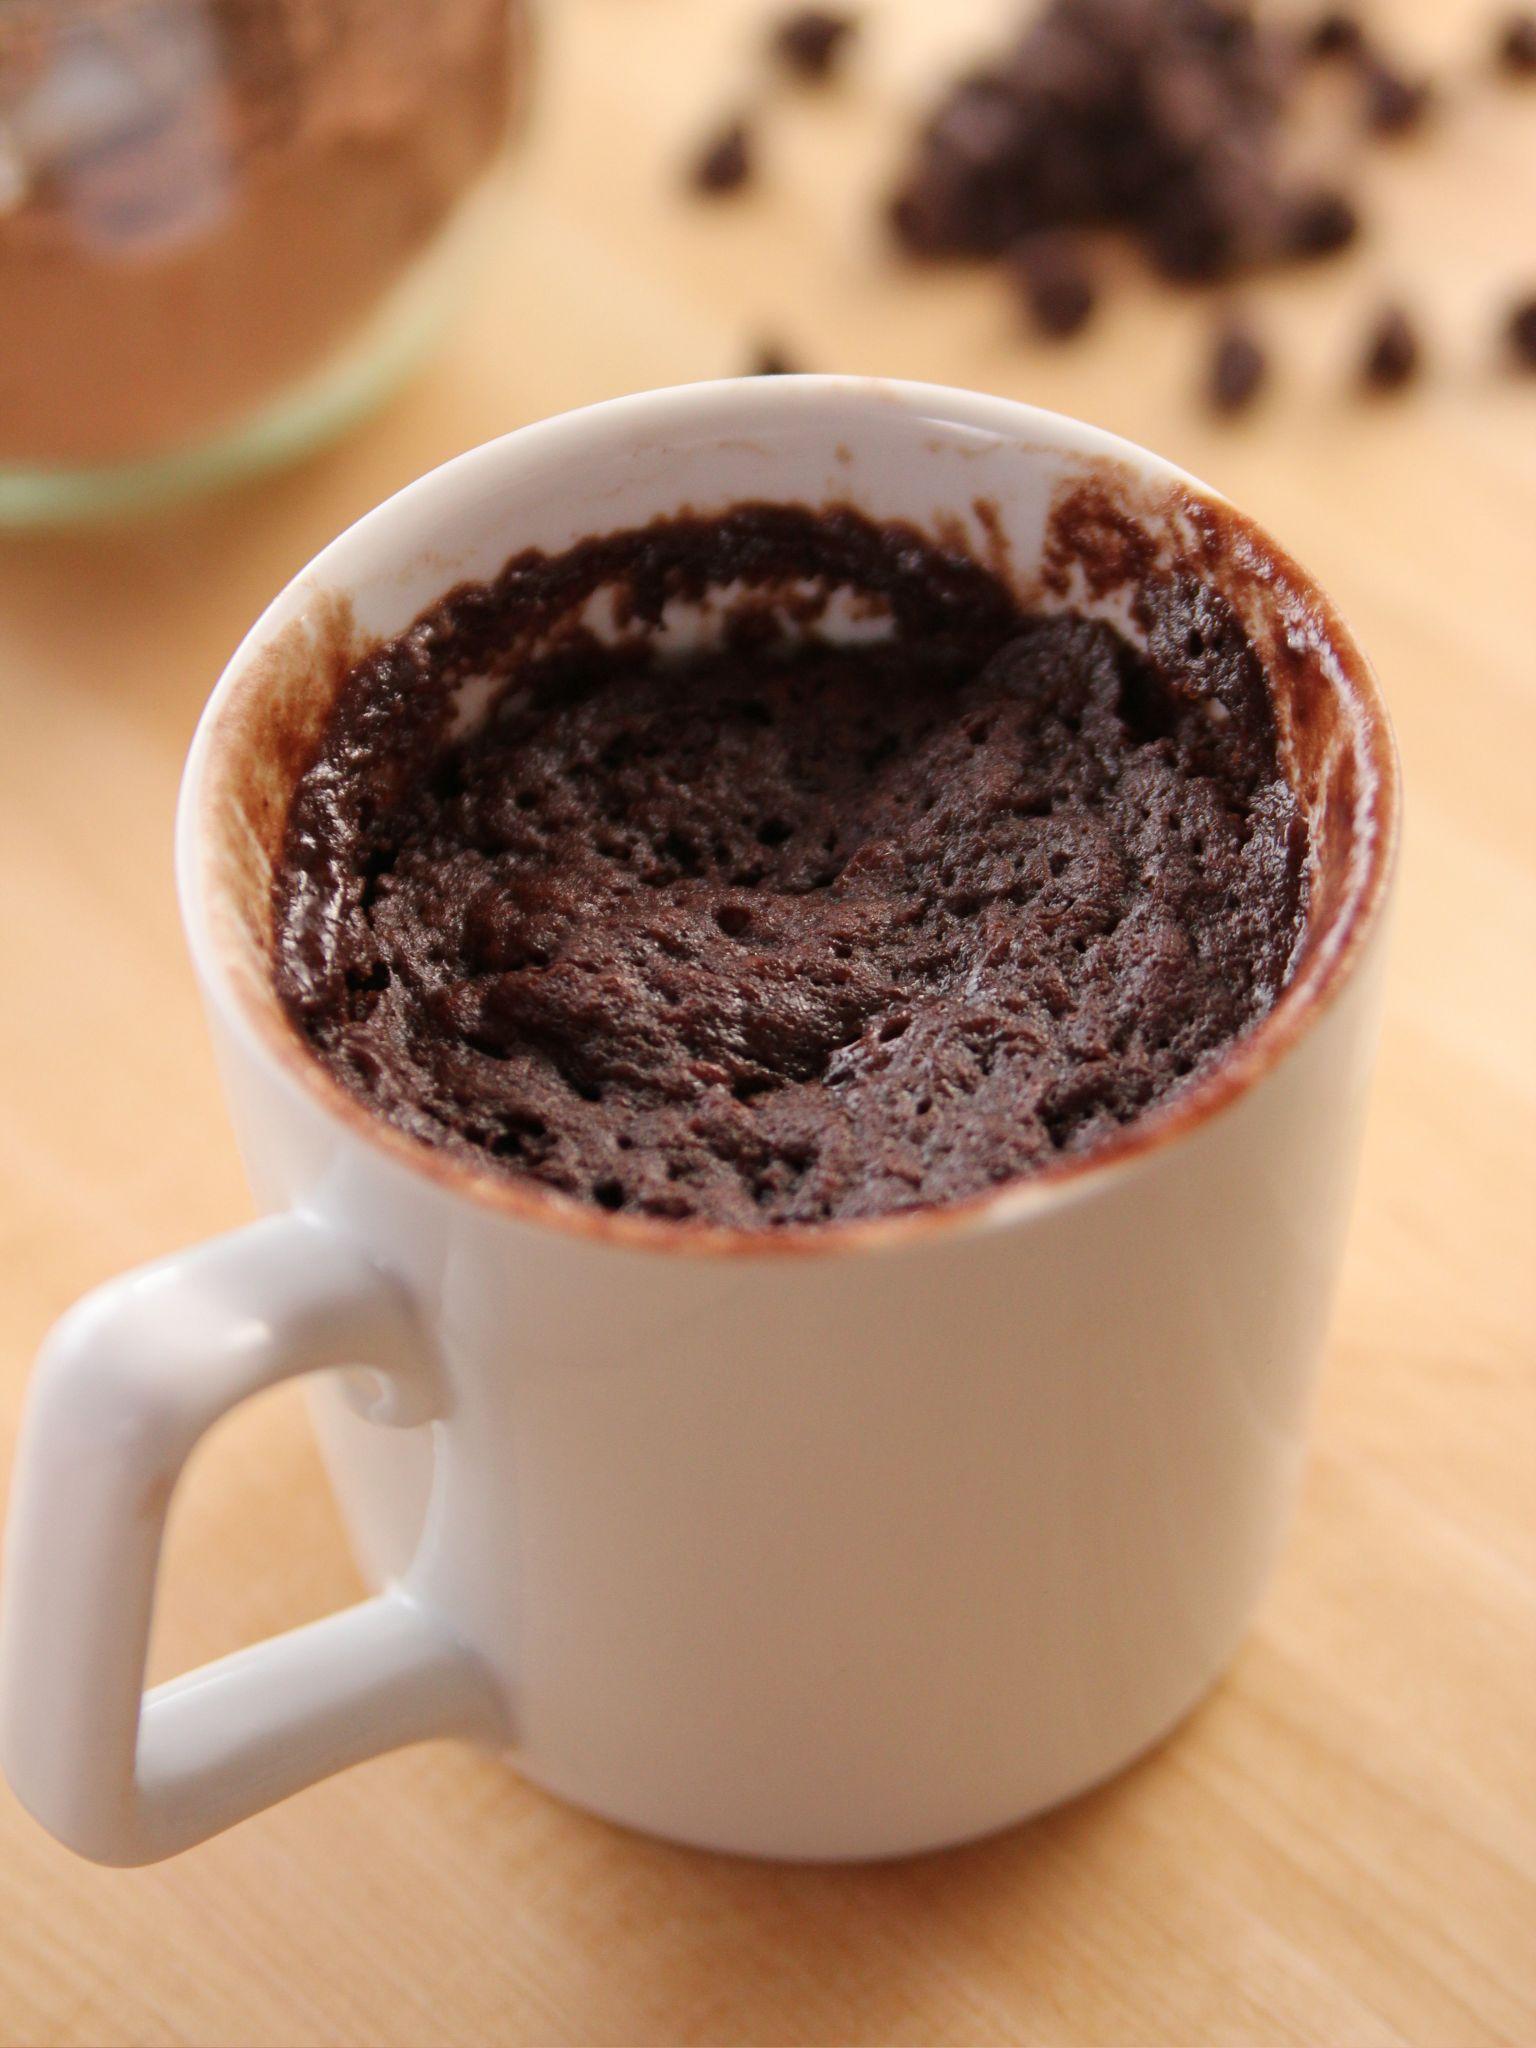 chocolate cake in a mug